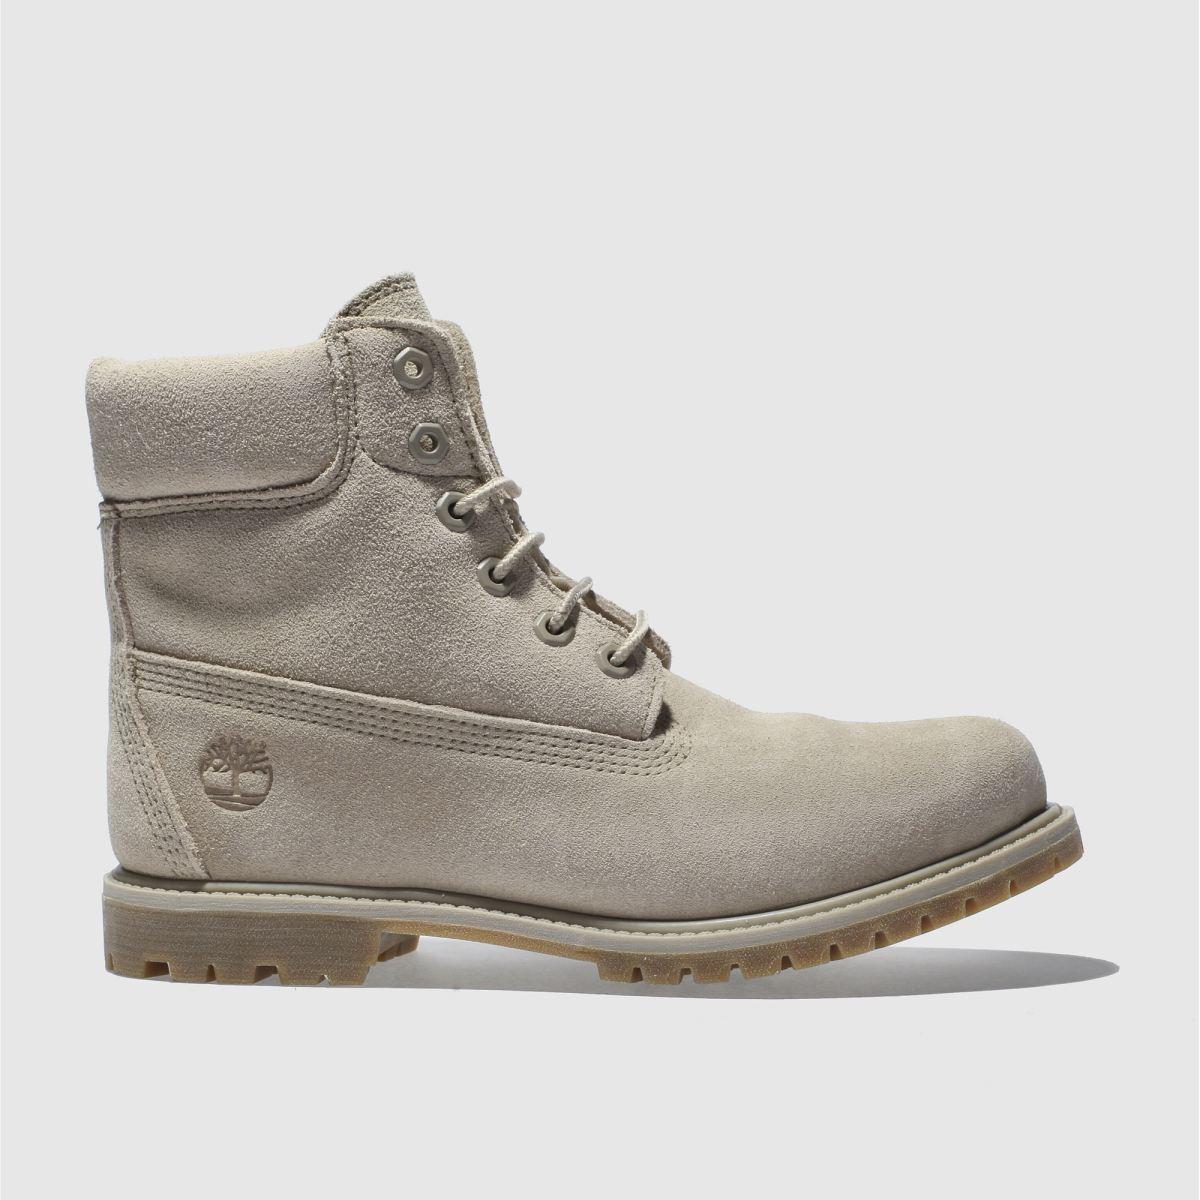 Timberland Beige 6 Inch Premium Suede Boots